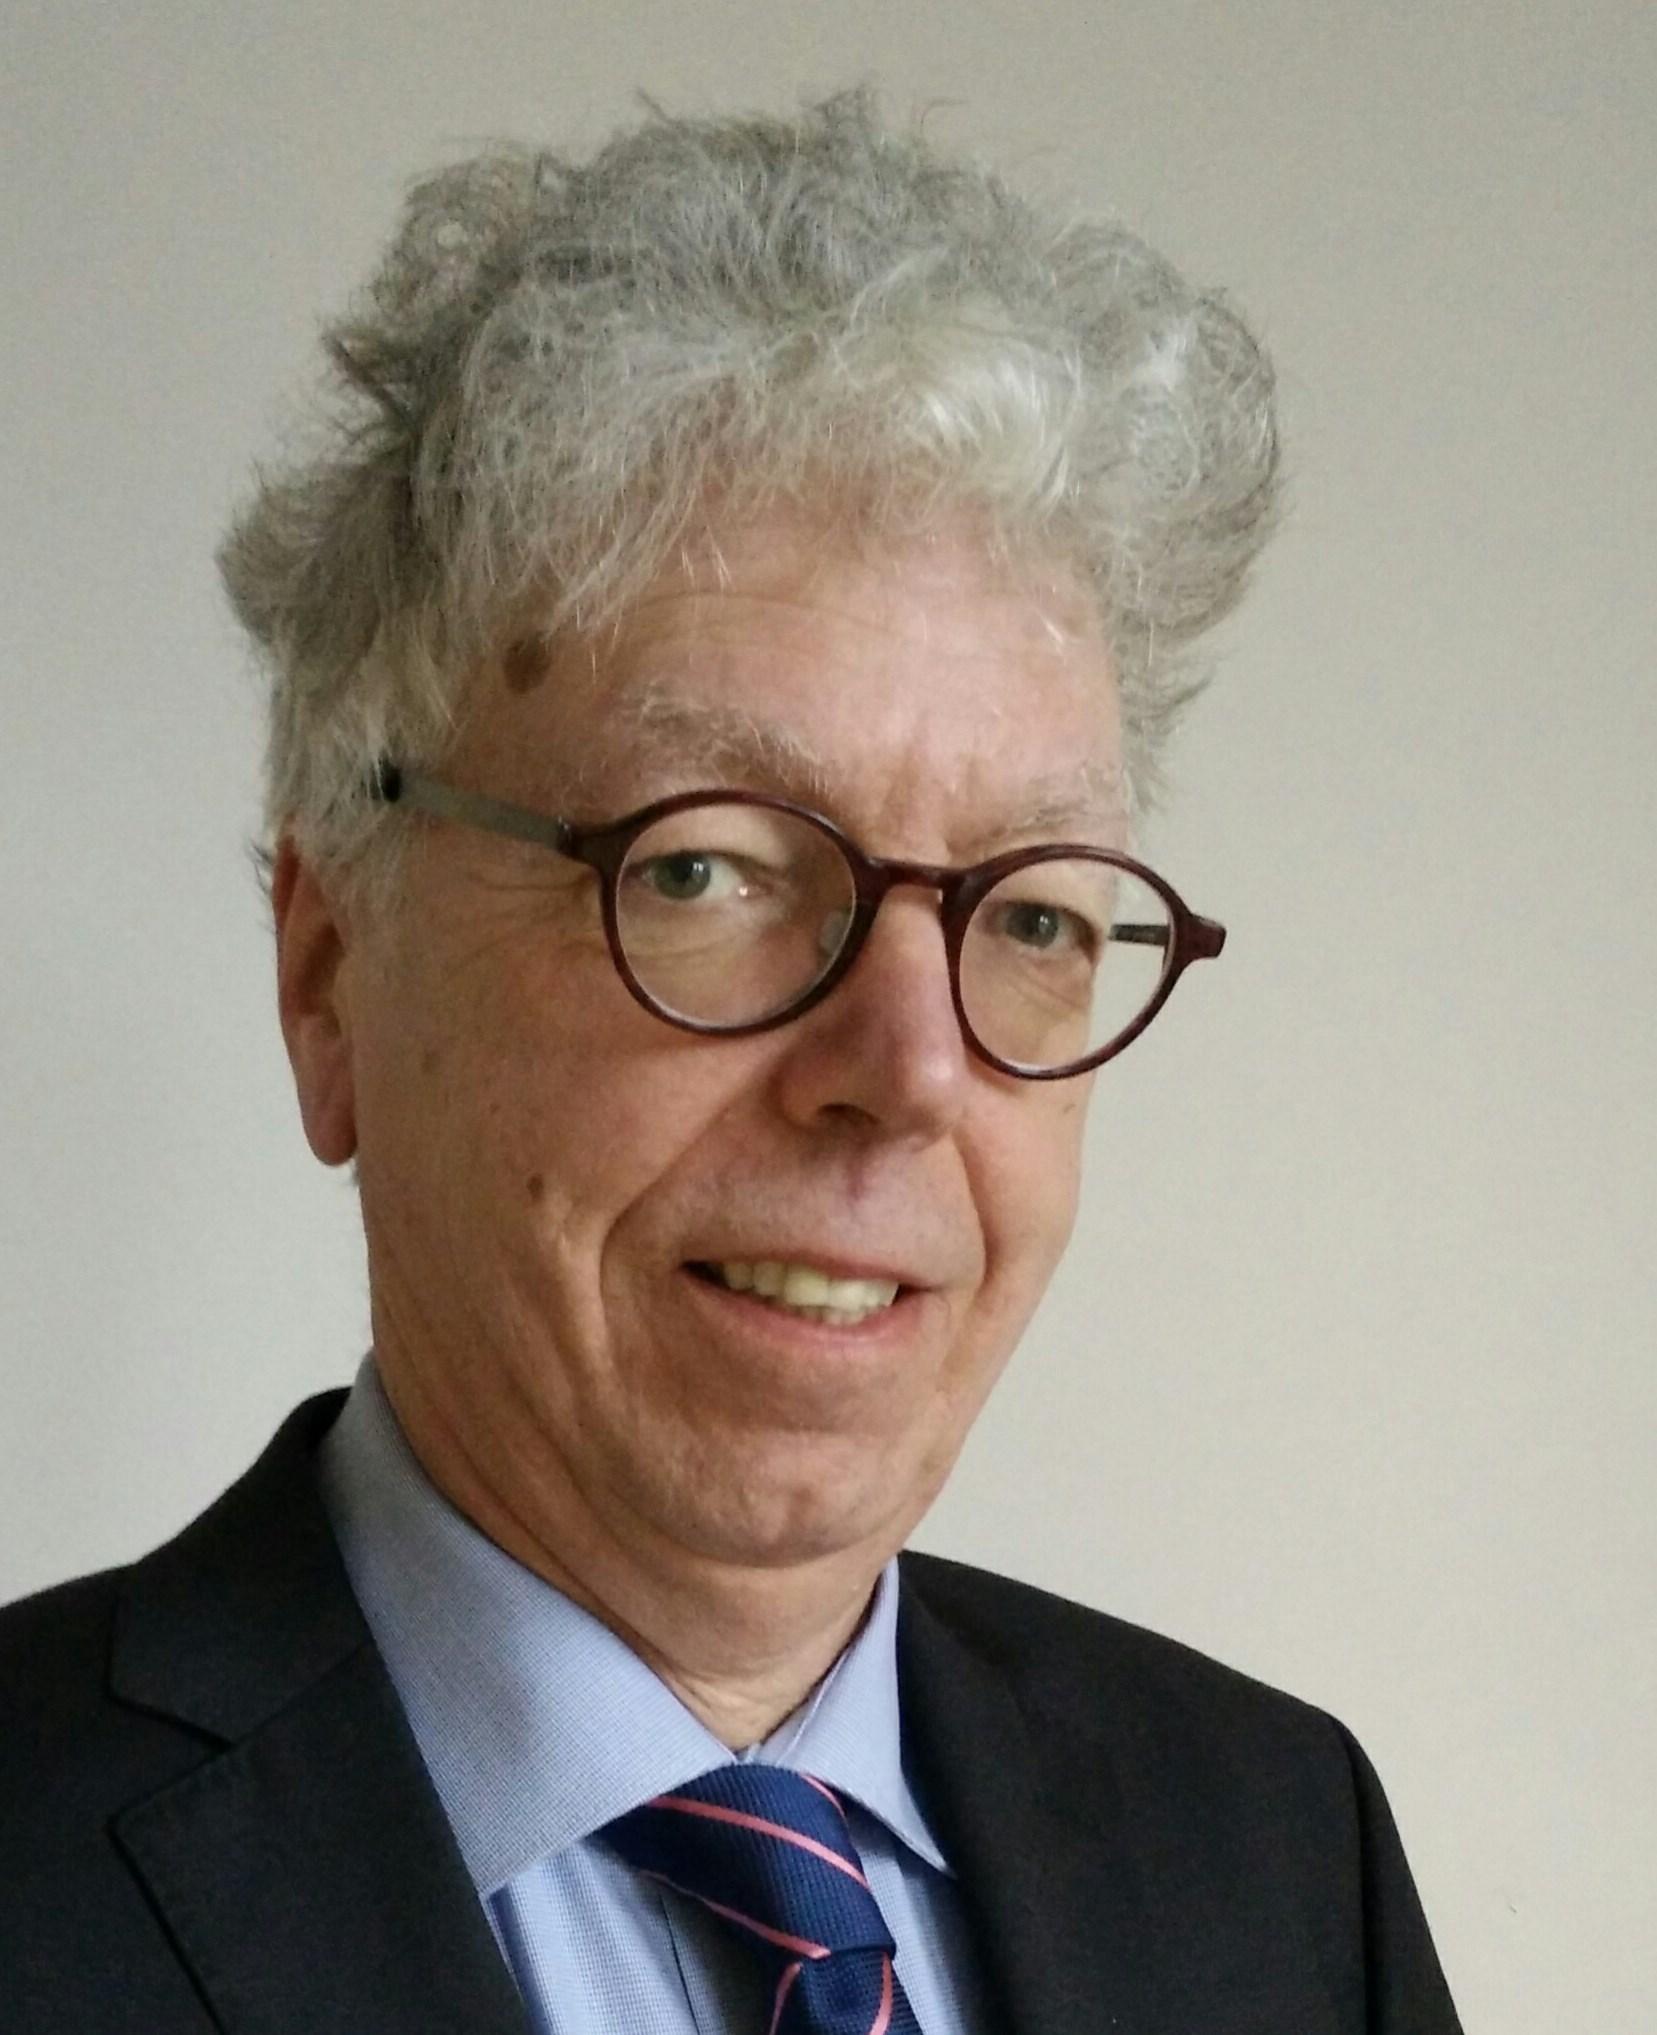 Gerard Zwetsloot